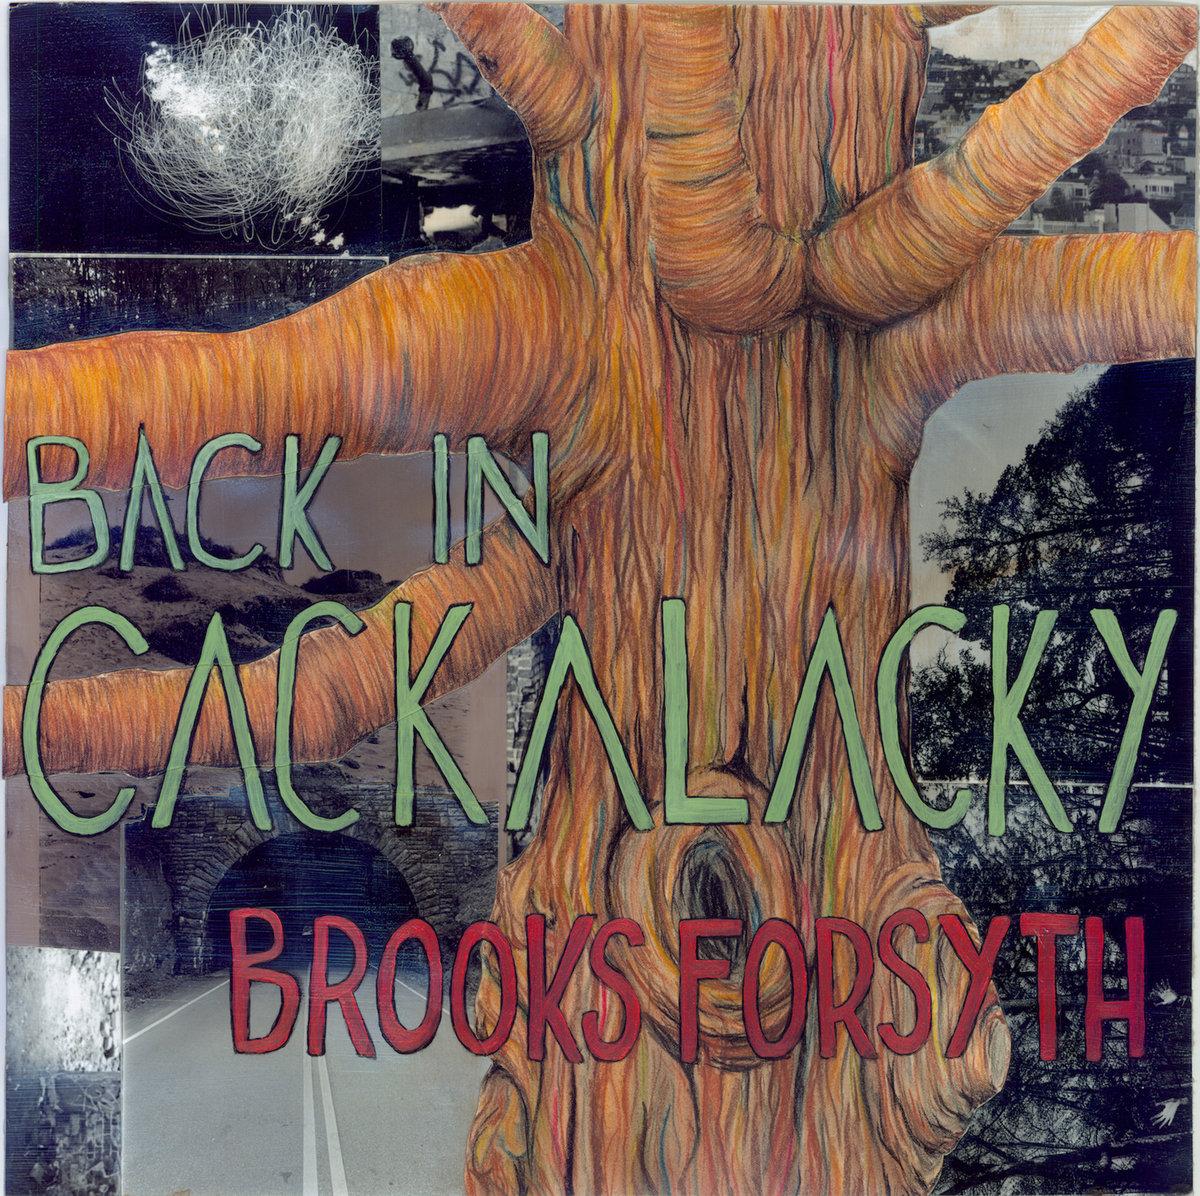 backincackalacky.jpg